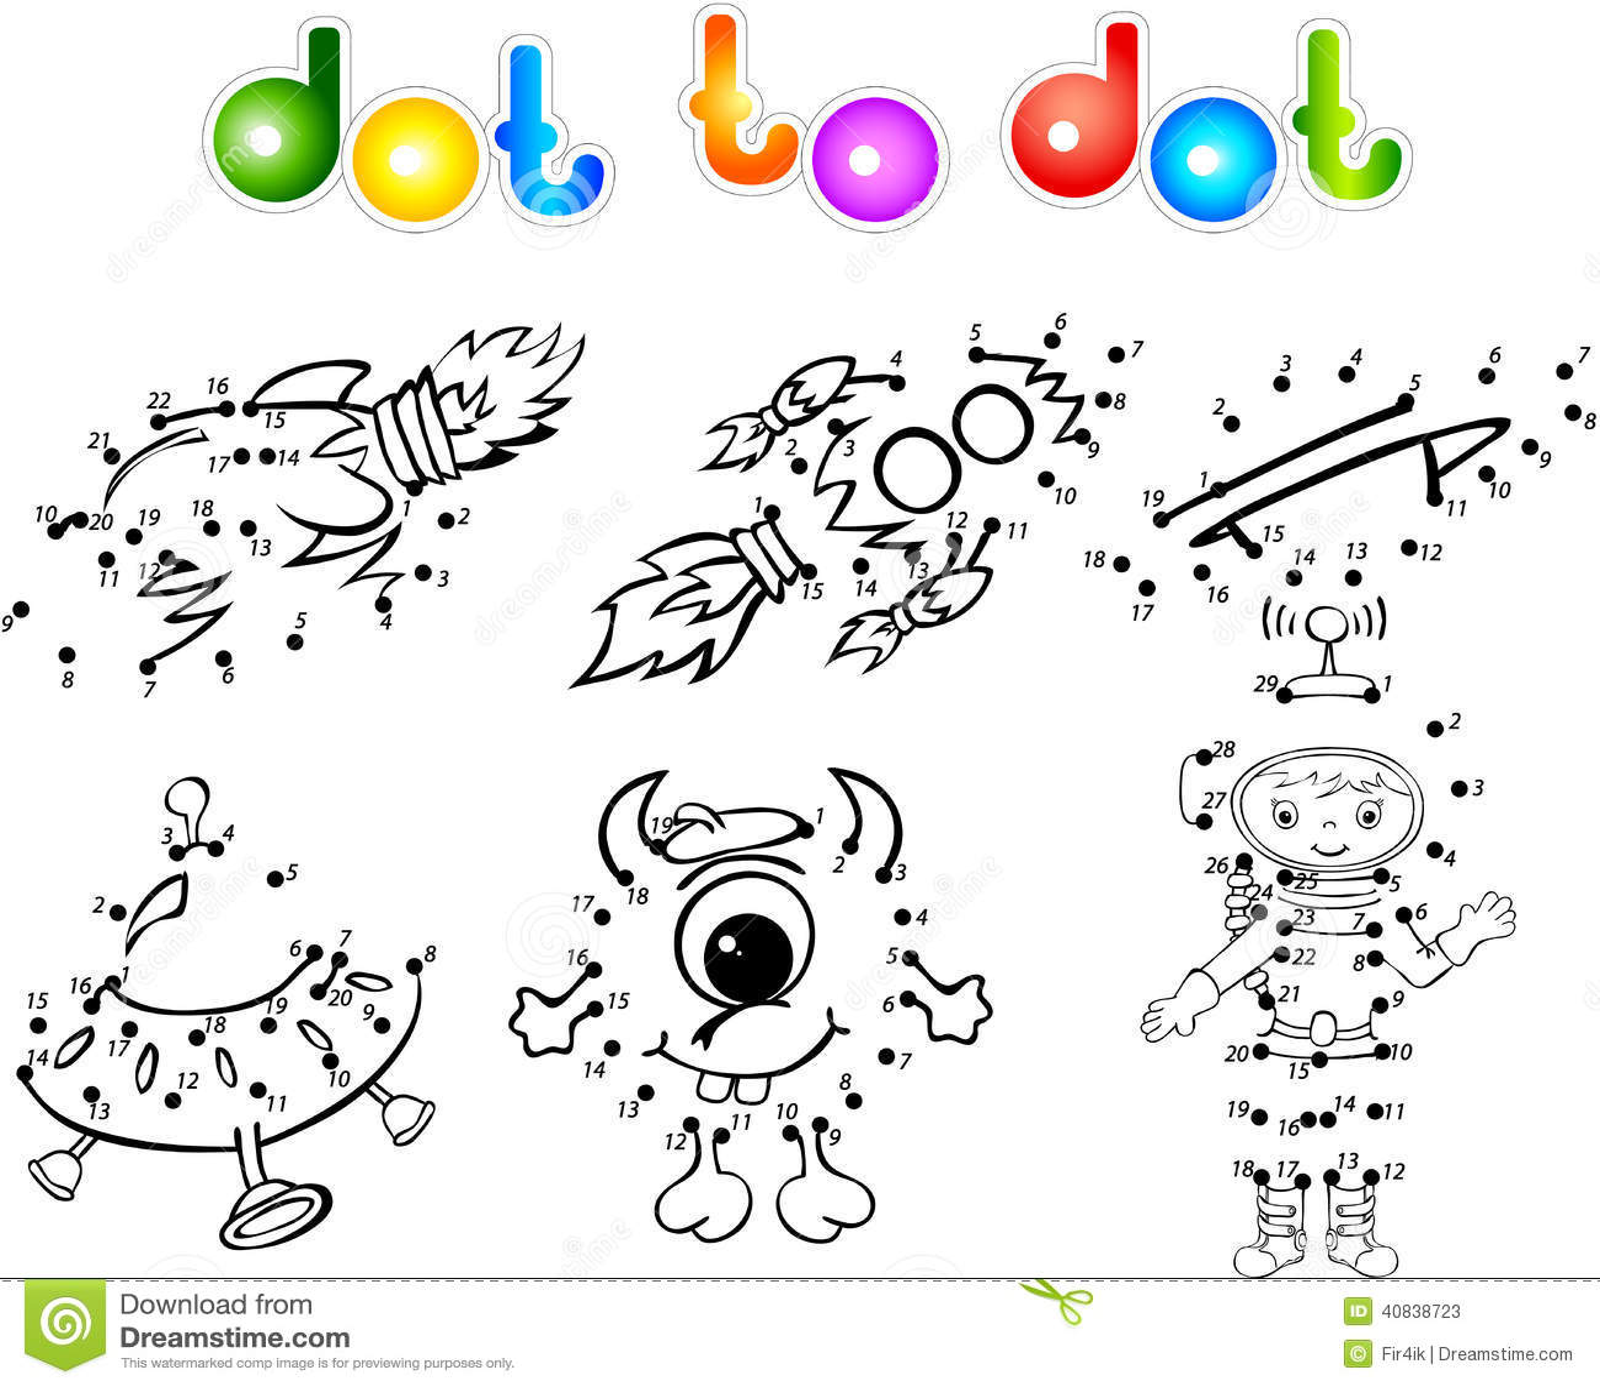 Spase Set 2 Dot To Dot Stock Vector - Image: 40838723